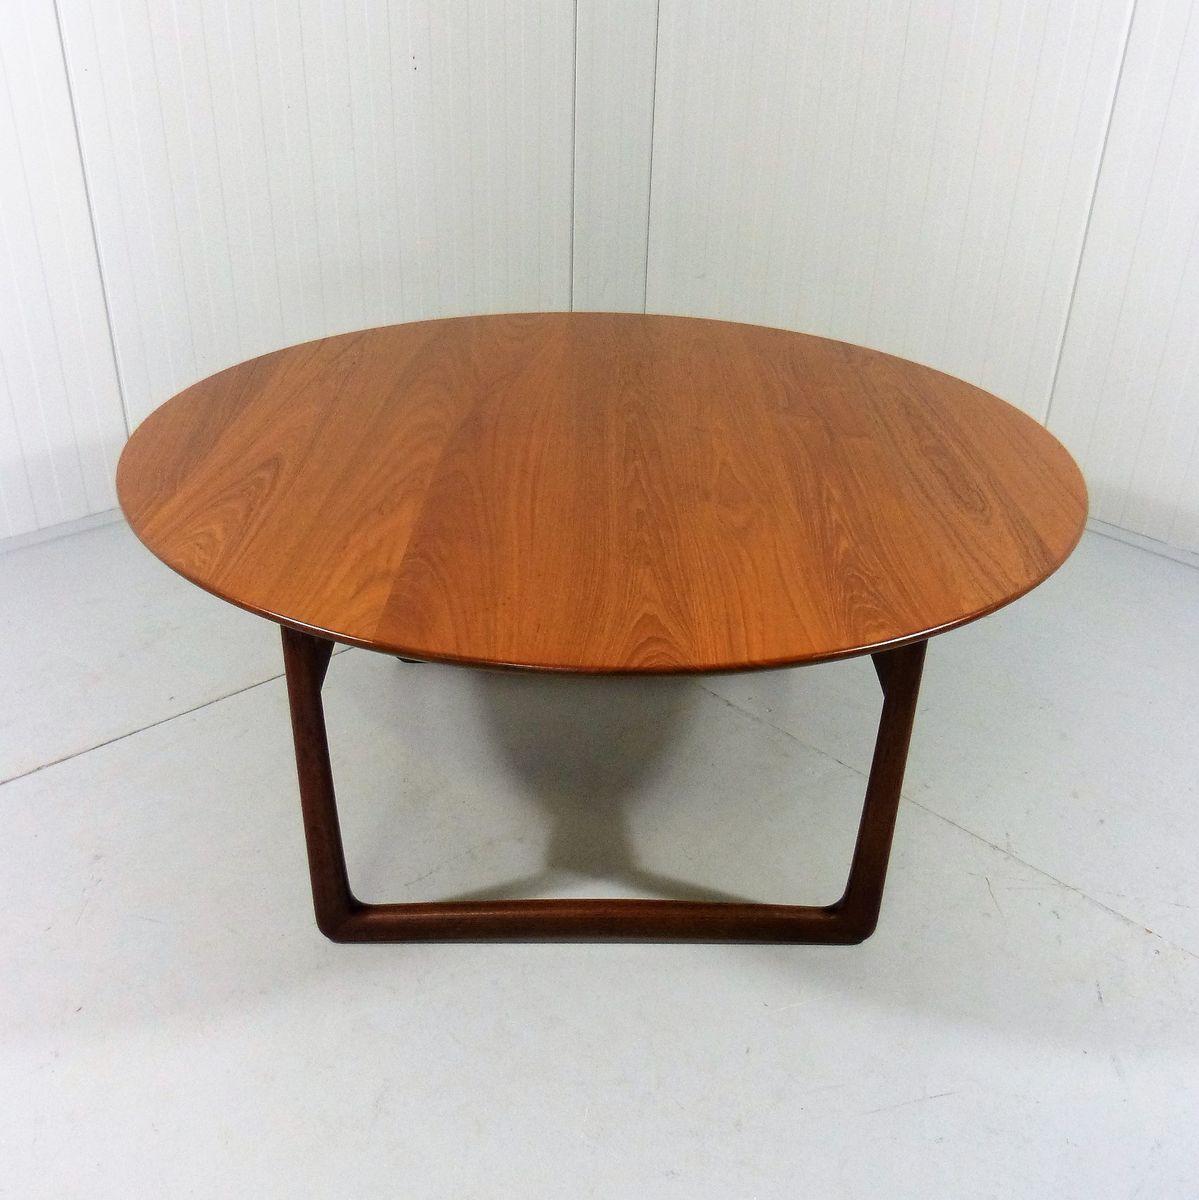 Round Teak Coffee Table By Peter Hvidt Orla M Lgaard Nielsen For France S N 1960s For Sale